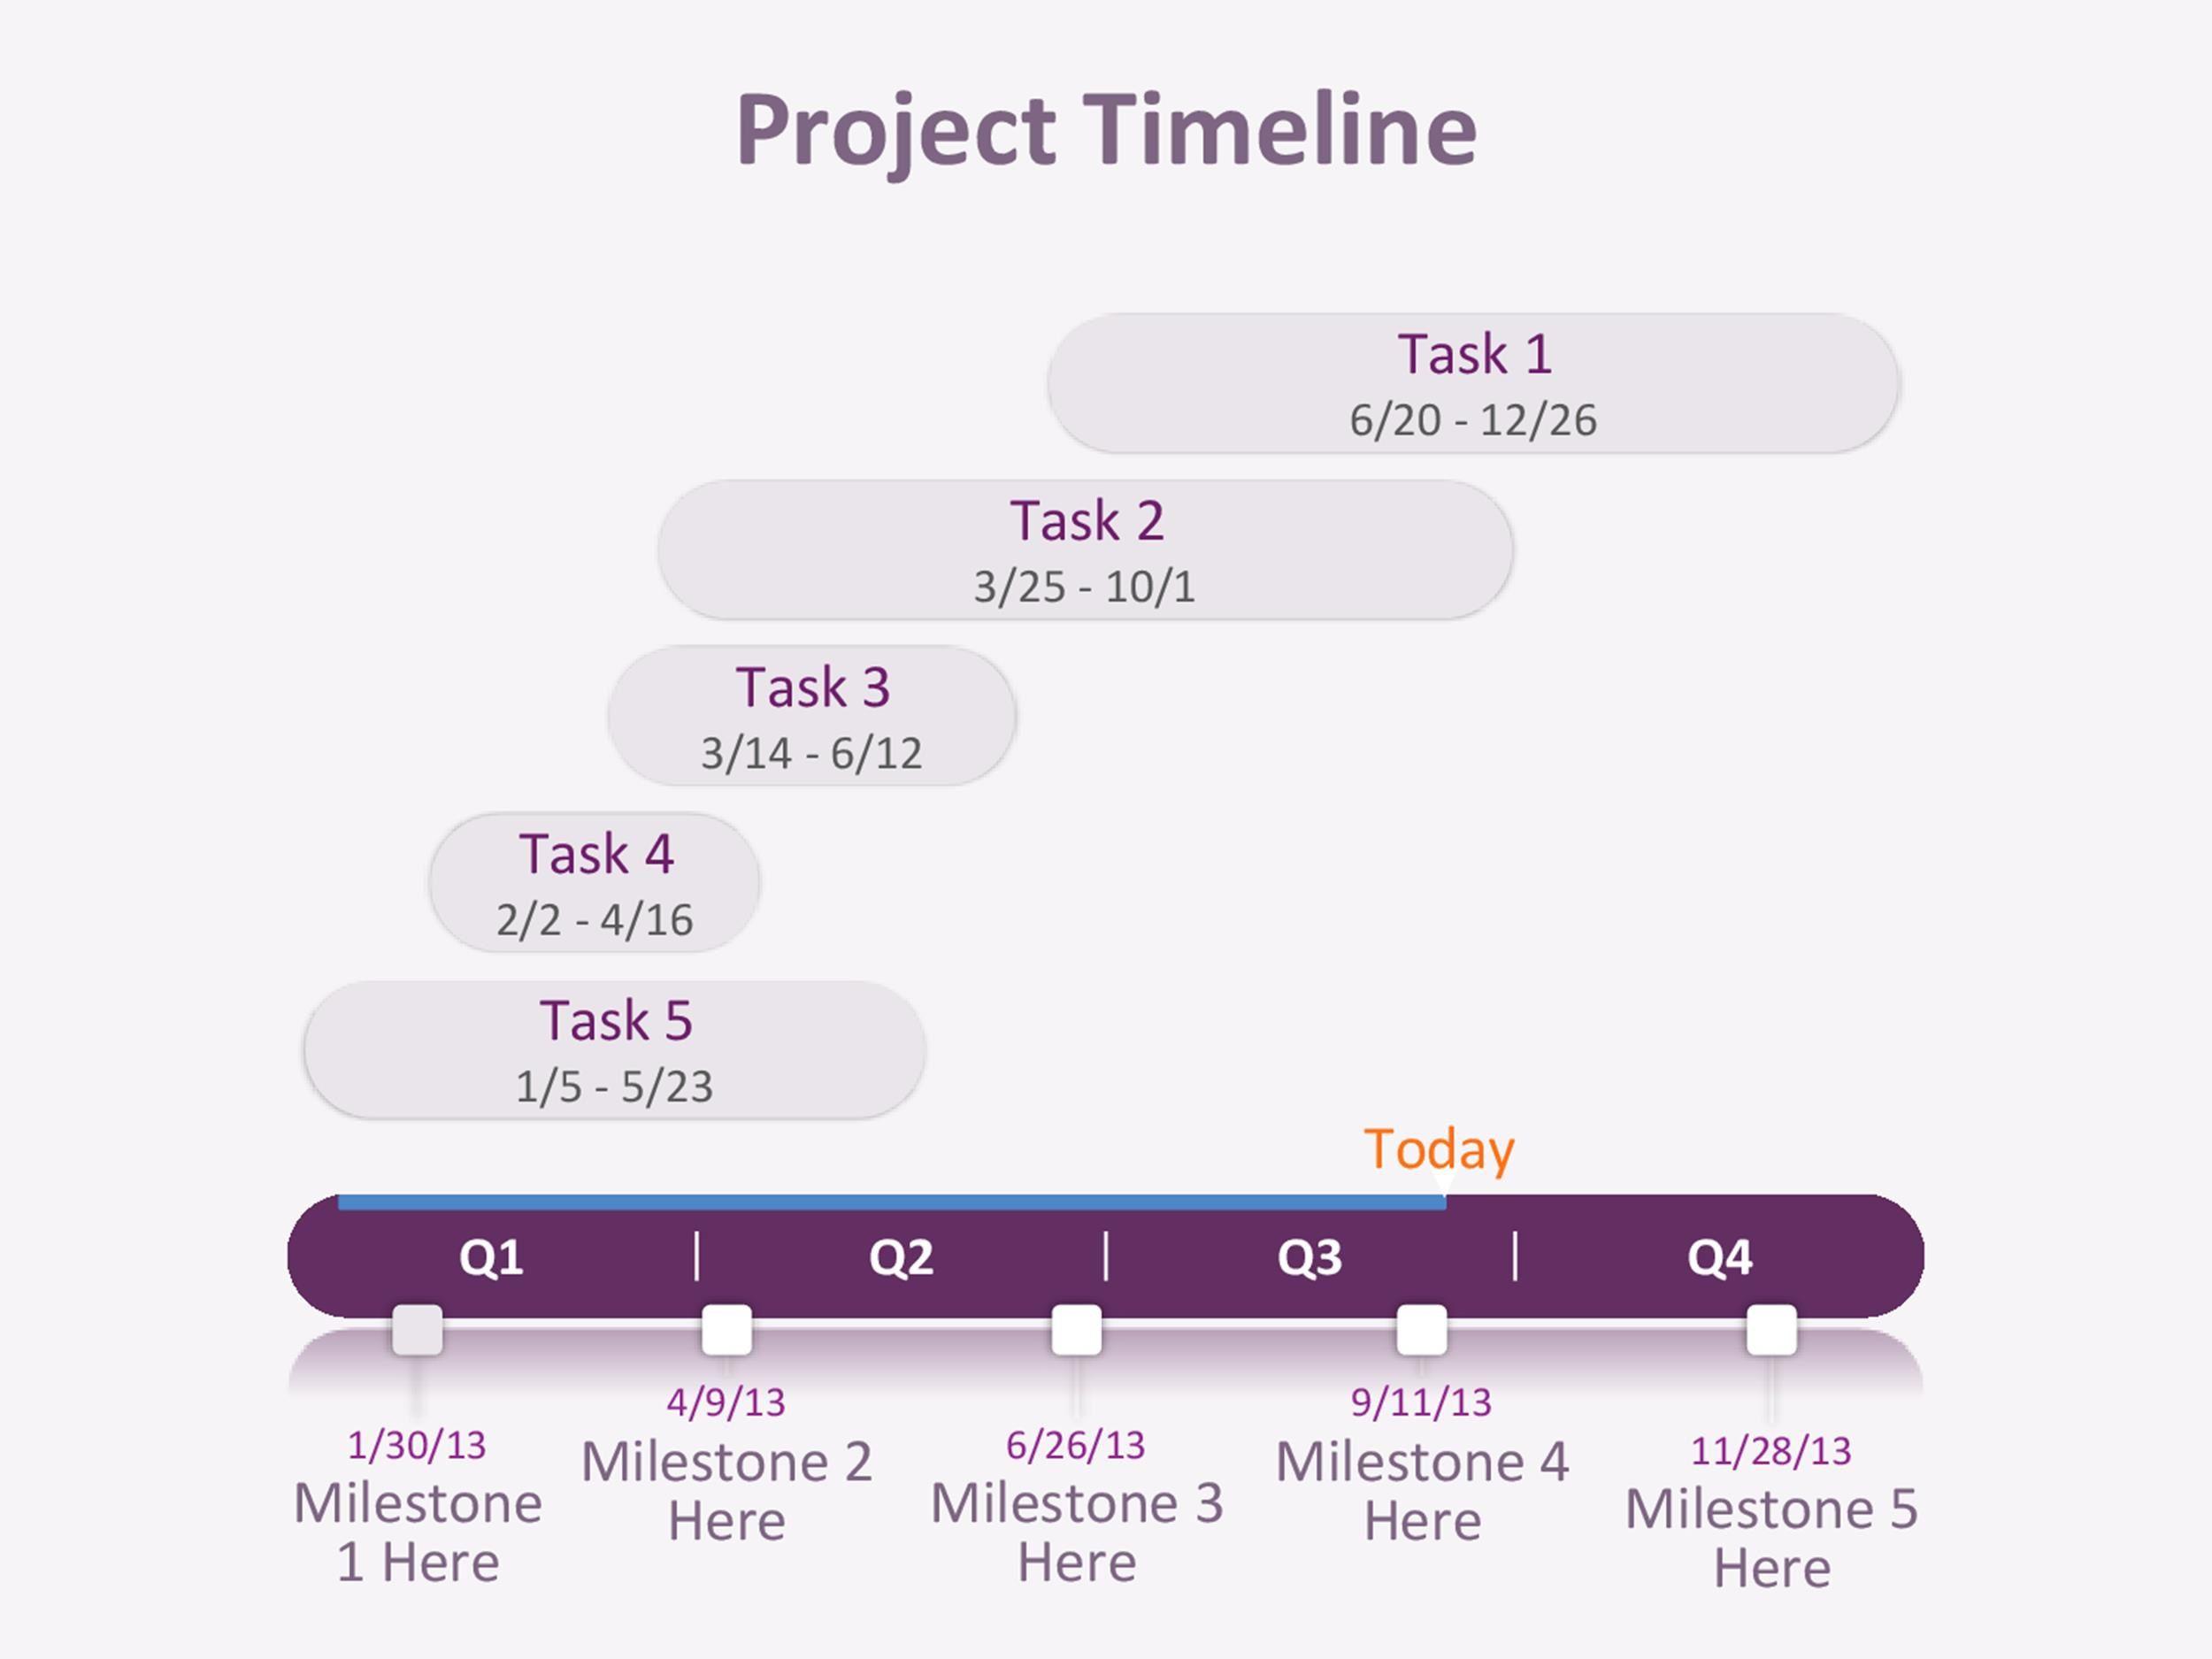 007 Remarkable Timeline Template For Word Design  Wordpres FreeFull